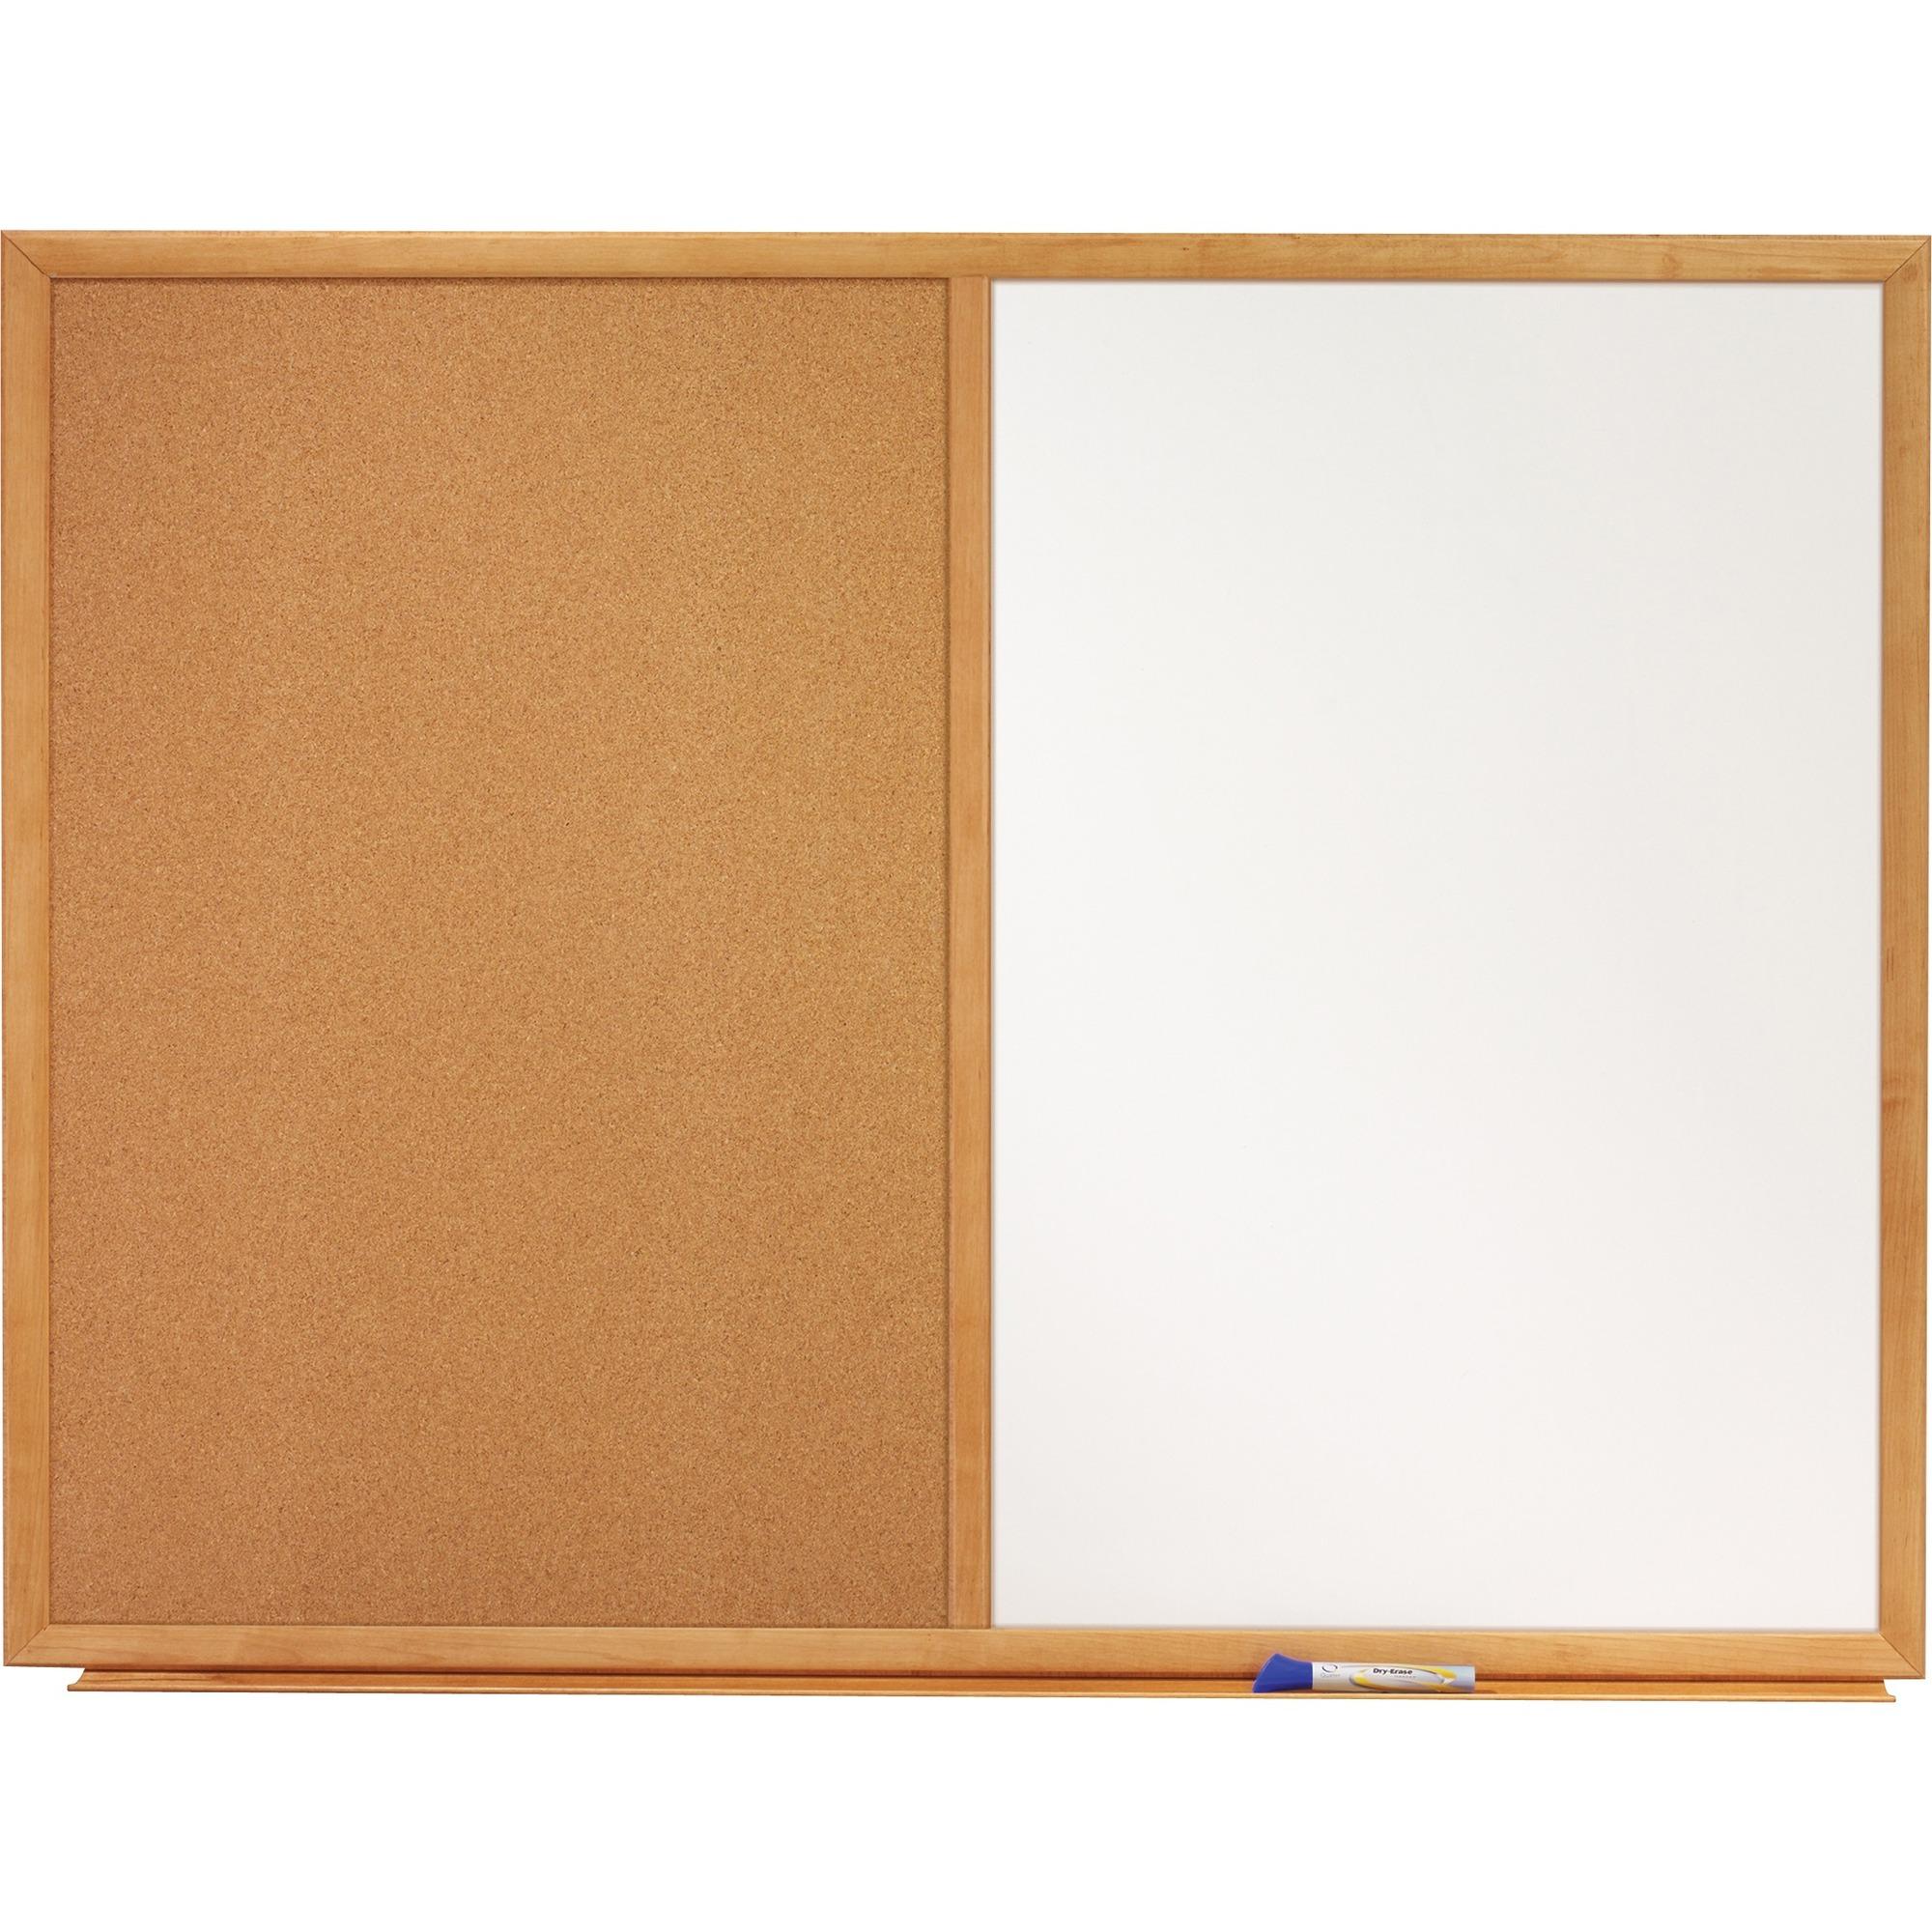 Acco Brands Corporation Quartet® Standard Combination Whiteboared/cork Bulletin Board, 3 X 2, Oak Finish Frame - 36 (3 Ft) Width X 24 (2 Ft) Height - White Melamine Surface - Oak Frame - Rectangle - Horizontal/vertical - 1 / Each